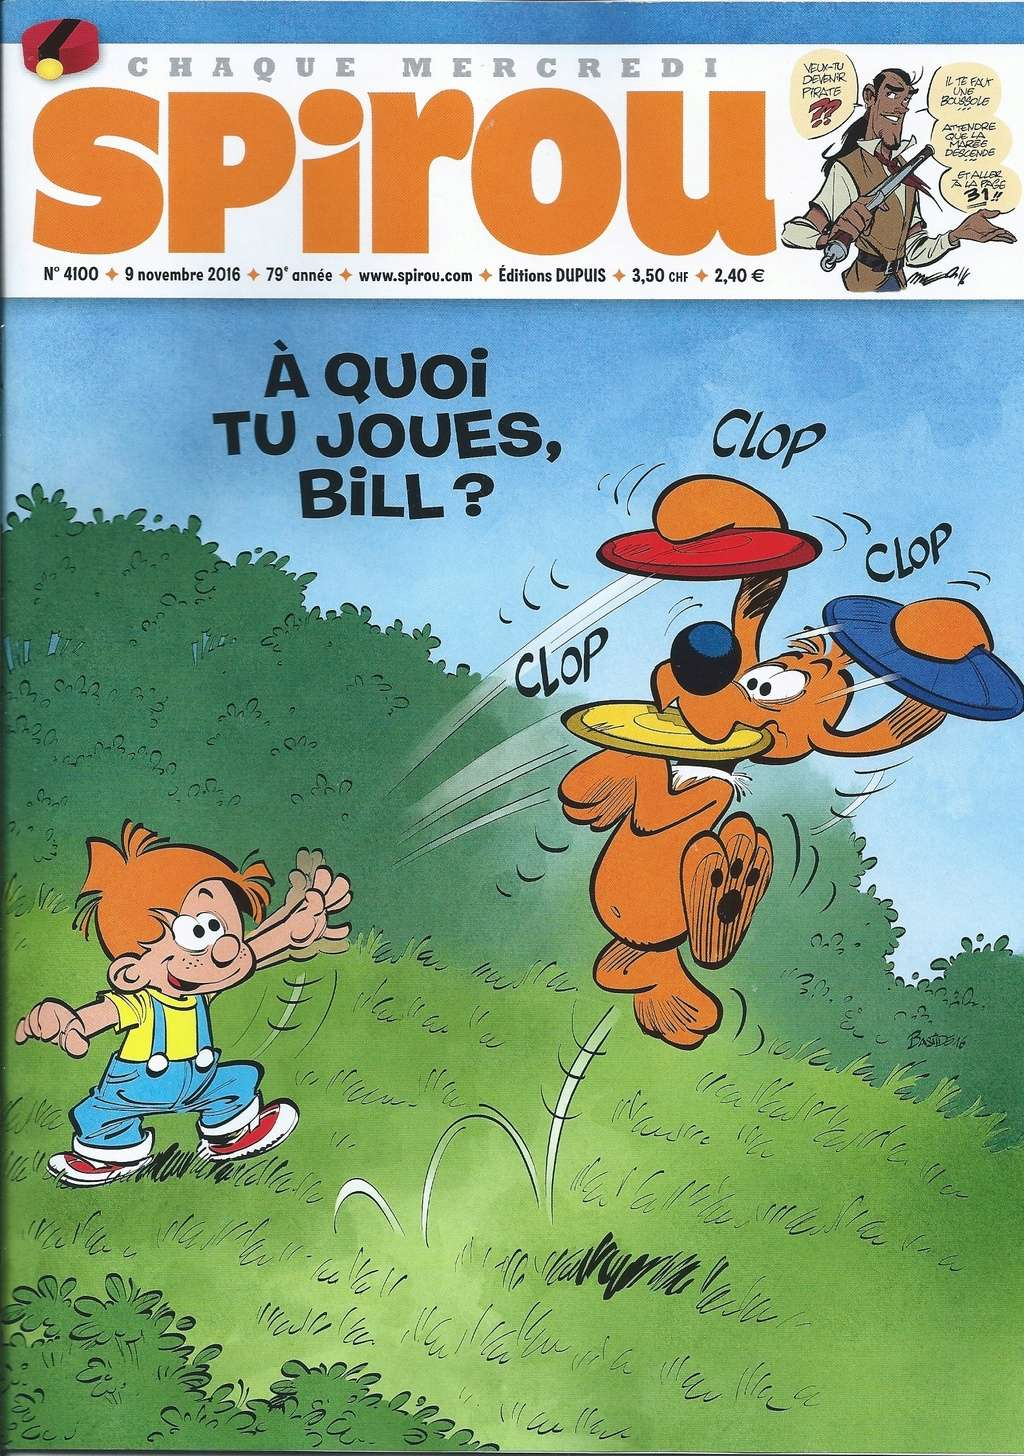 Spirou ... le journal - Page 18 Spirou10